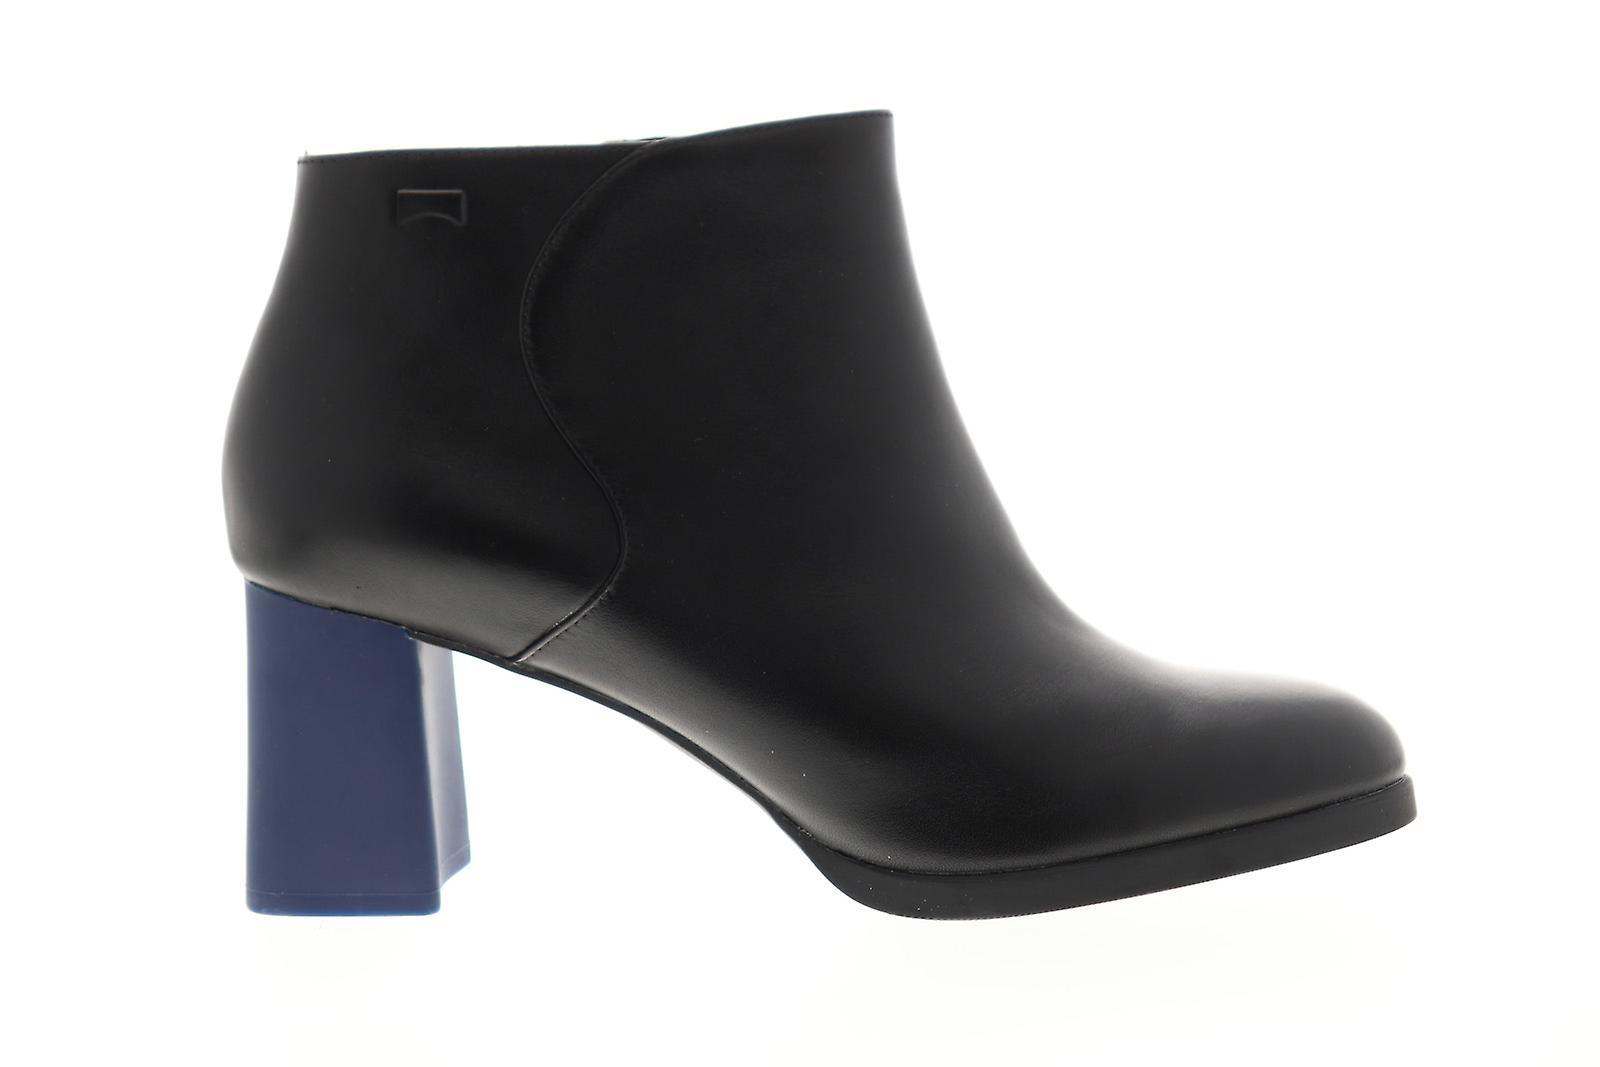 Camper Kara kvinner svart skinn glidelås pumper hæler sko